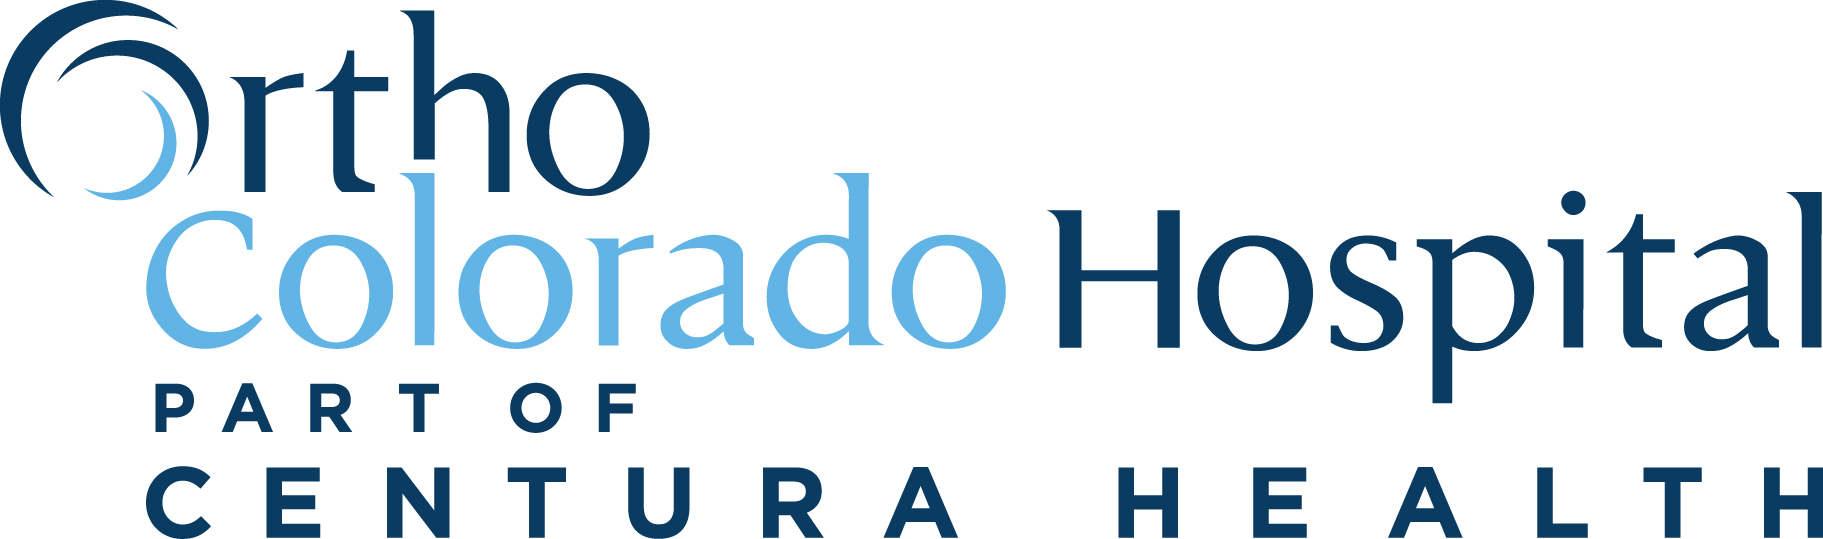 CENTURA HEALTH - ORTHOCOLORADO HOSPITAL